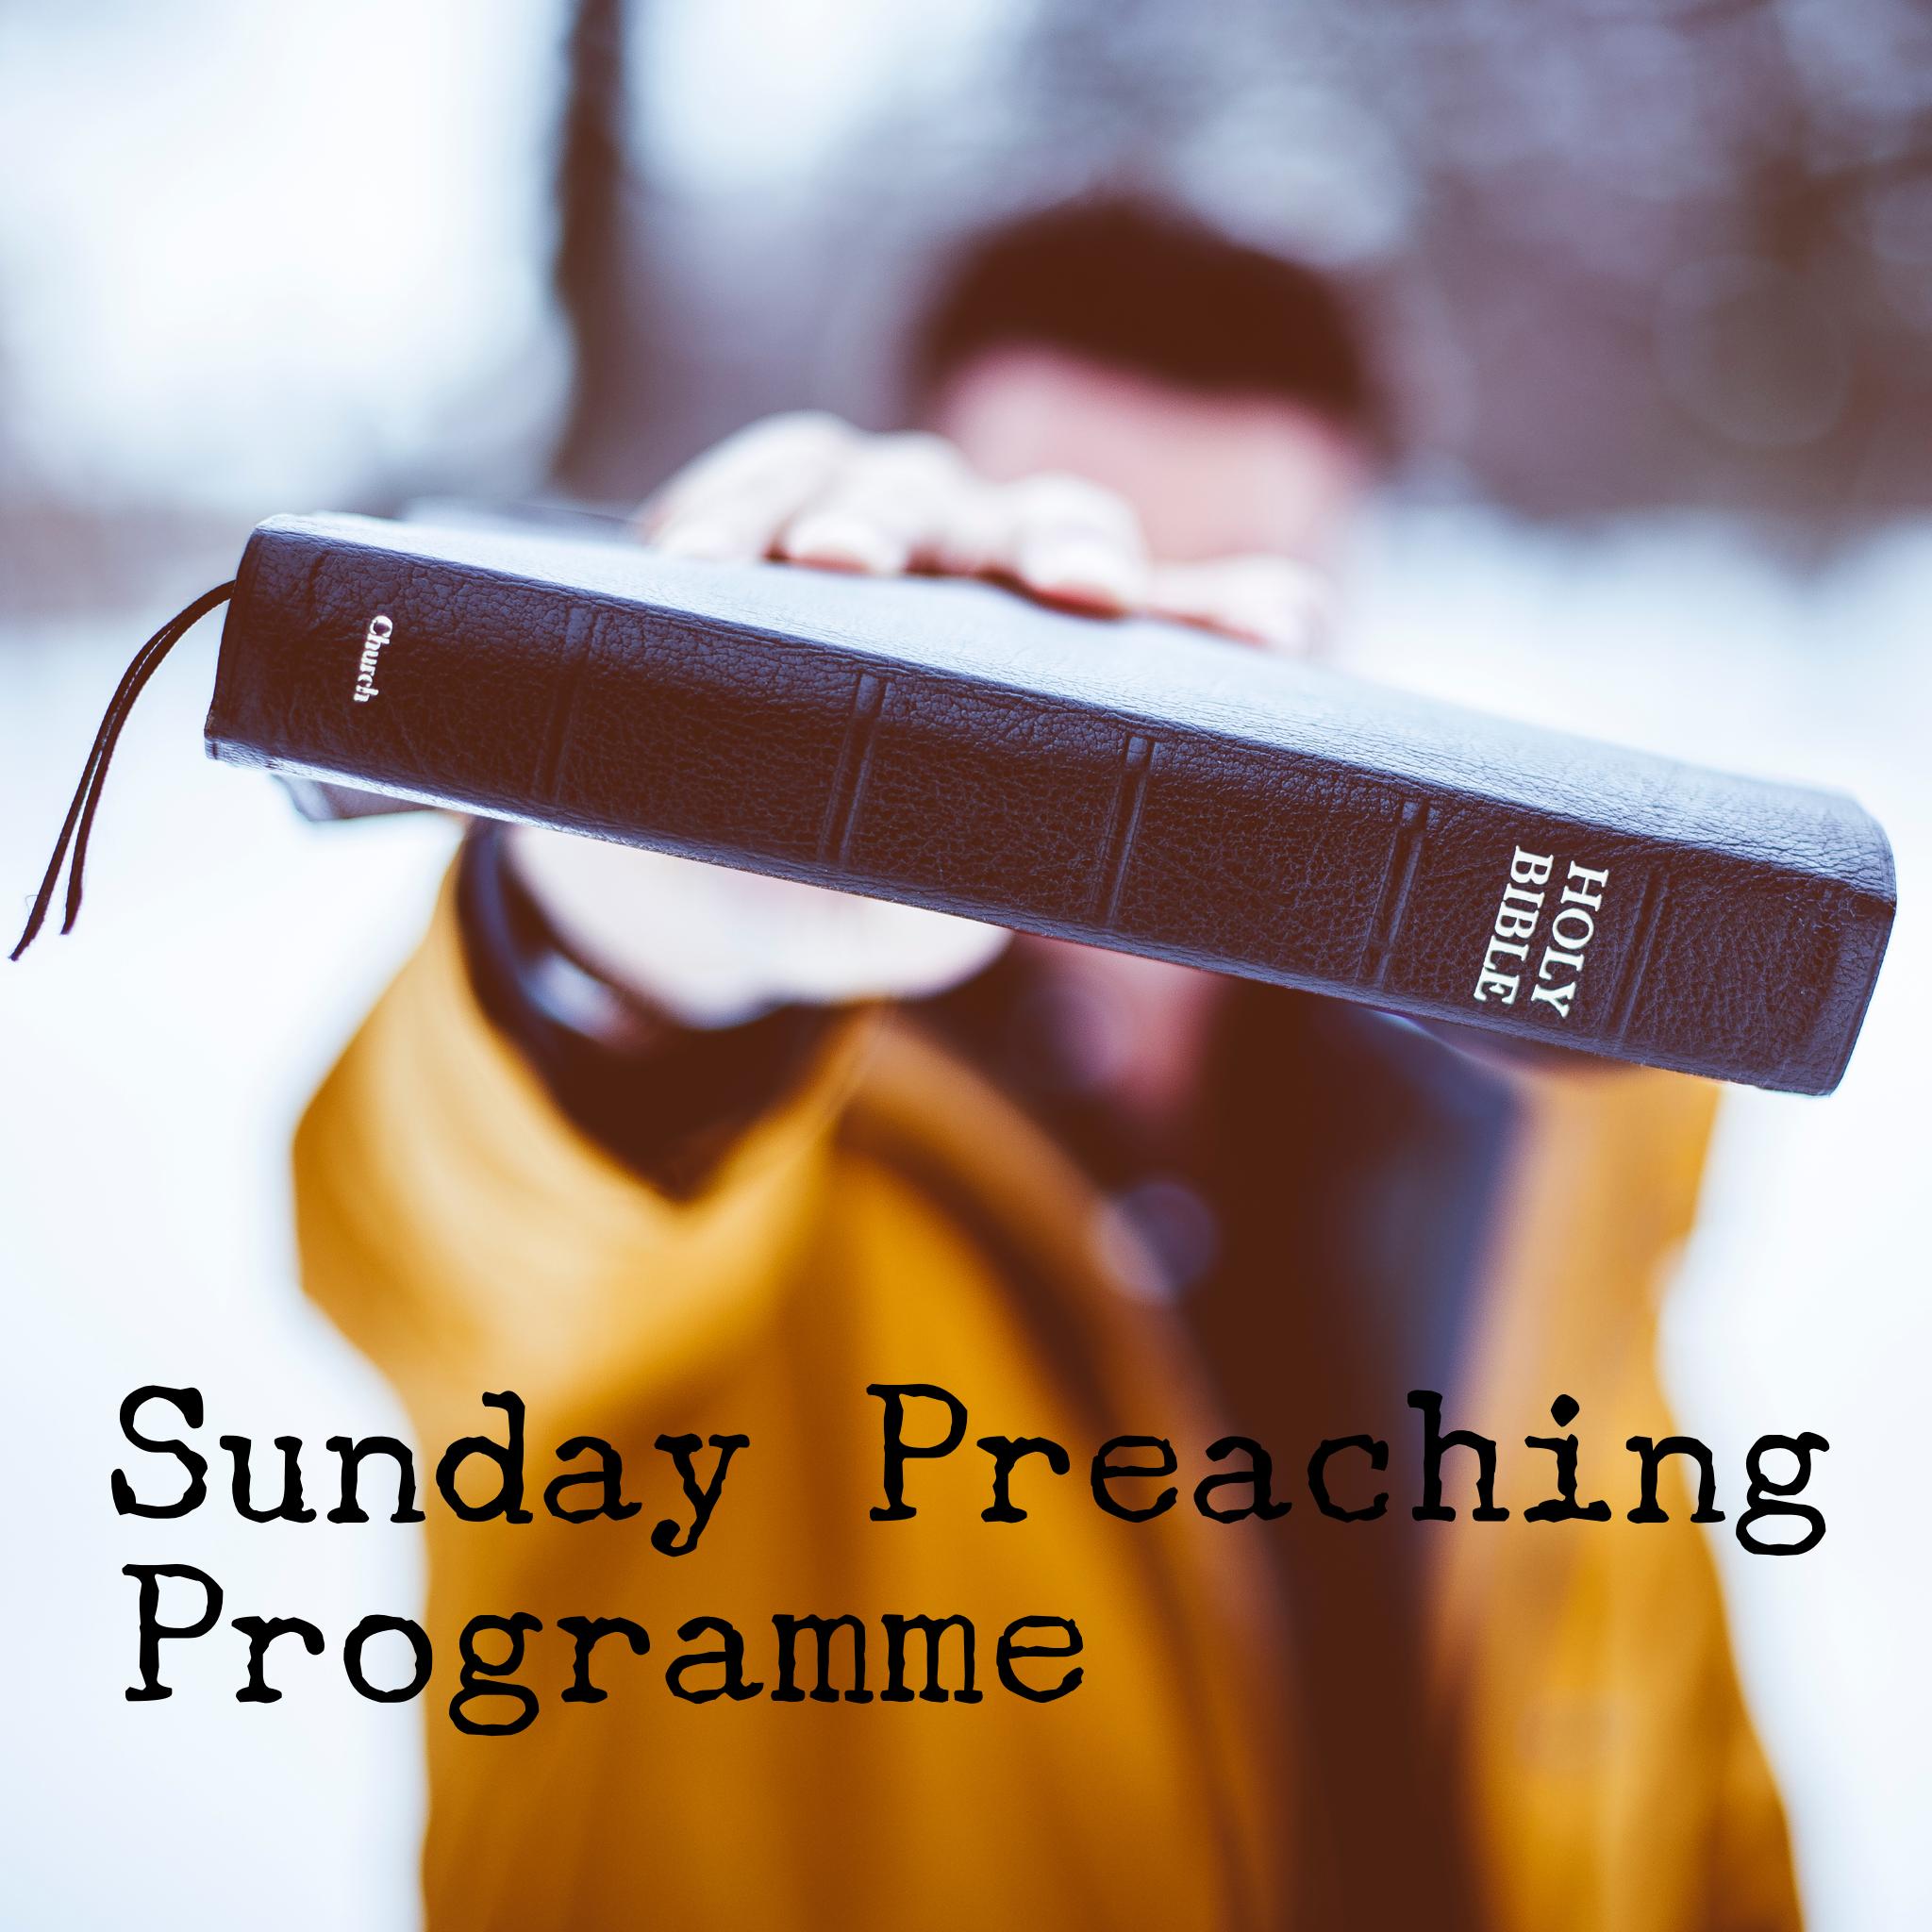 Sunday Preaching Program